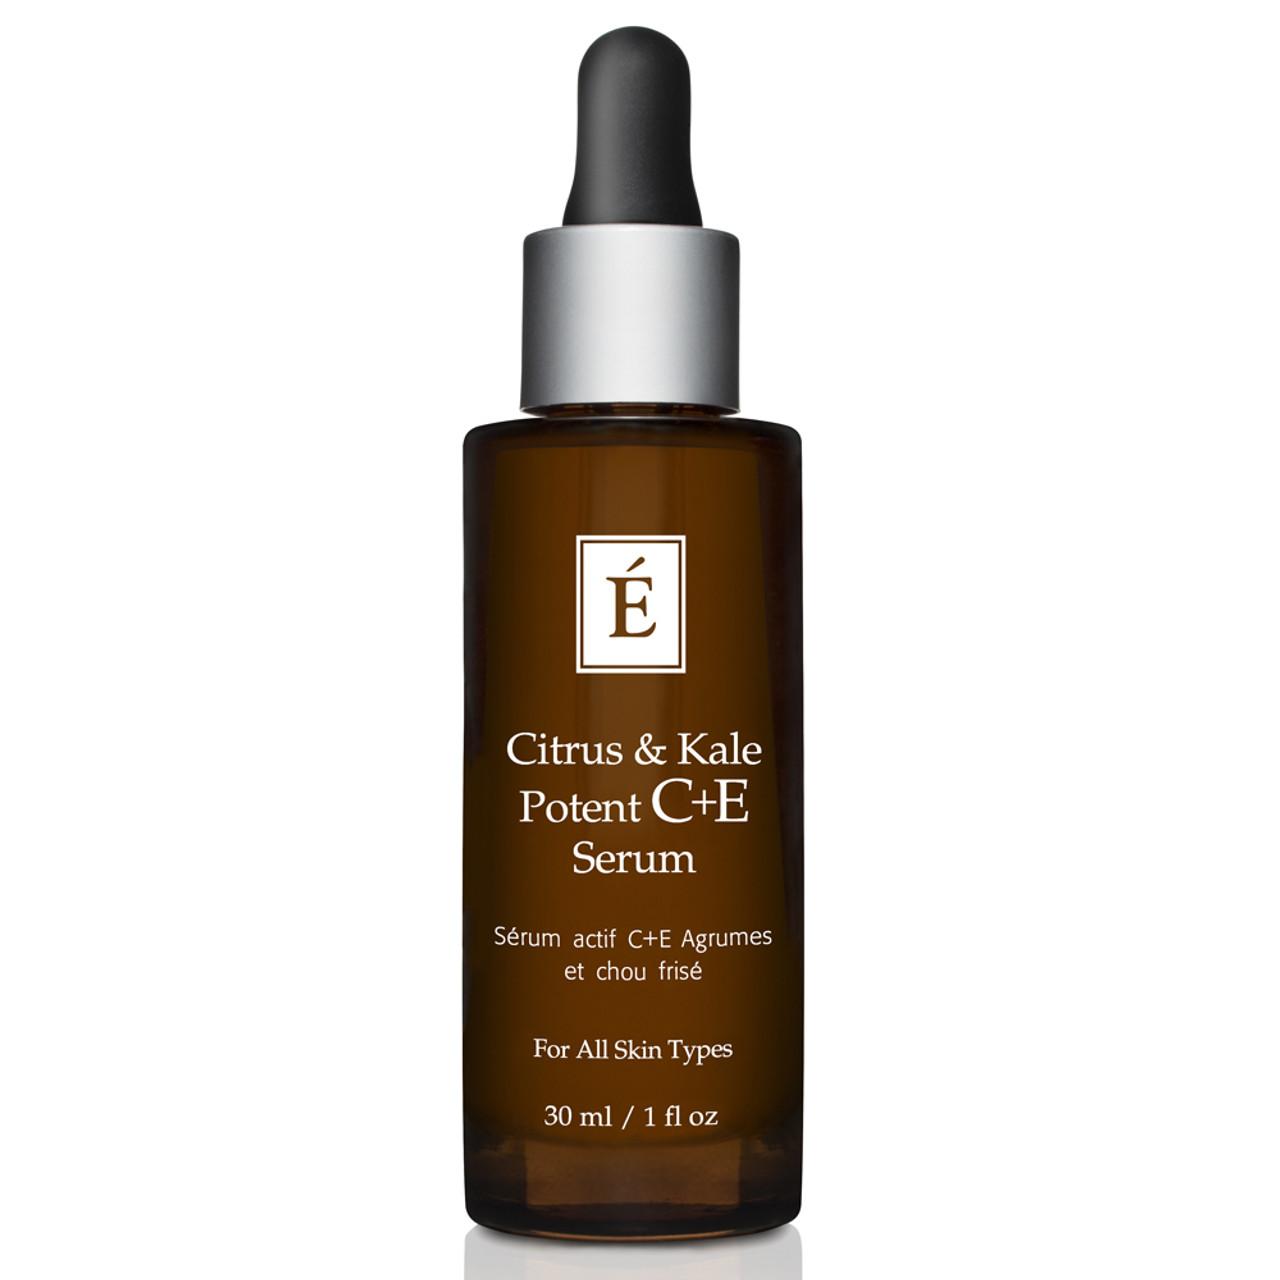 Eminence Citrus and Kale Potent C + E Serum